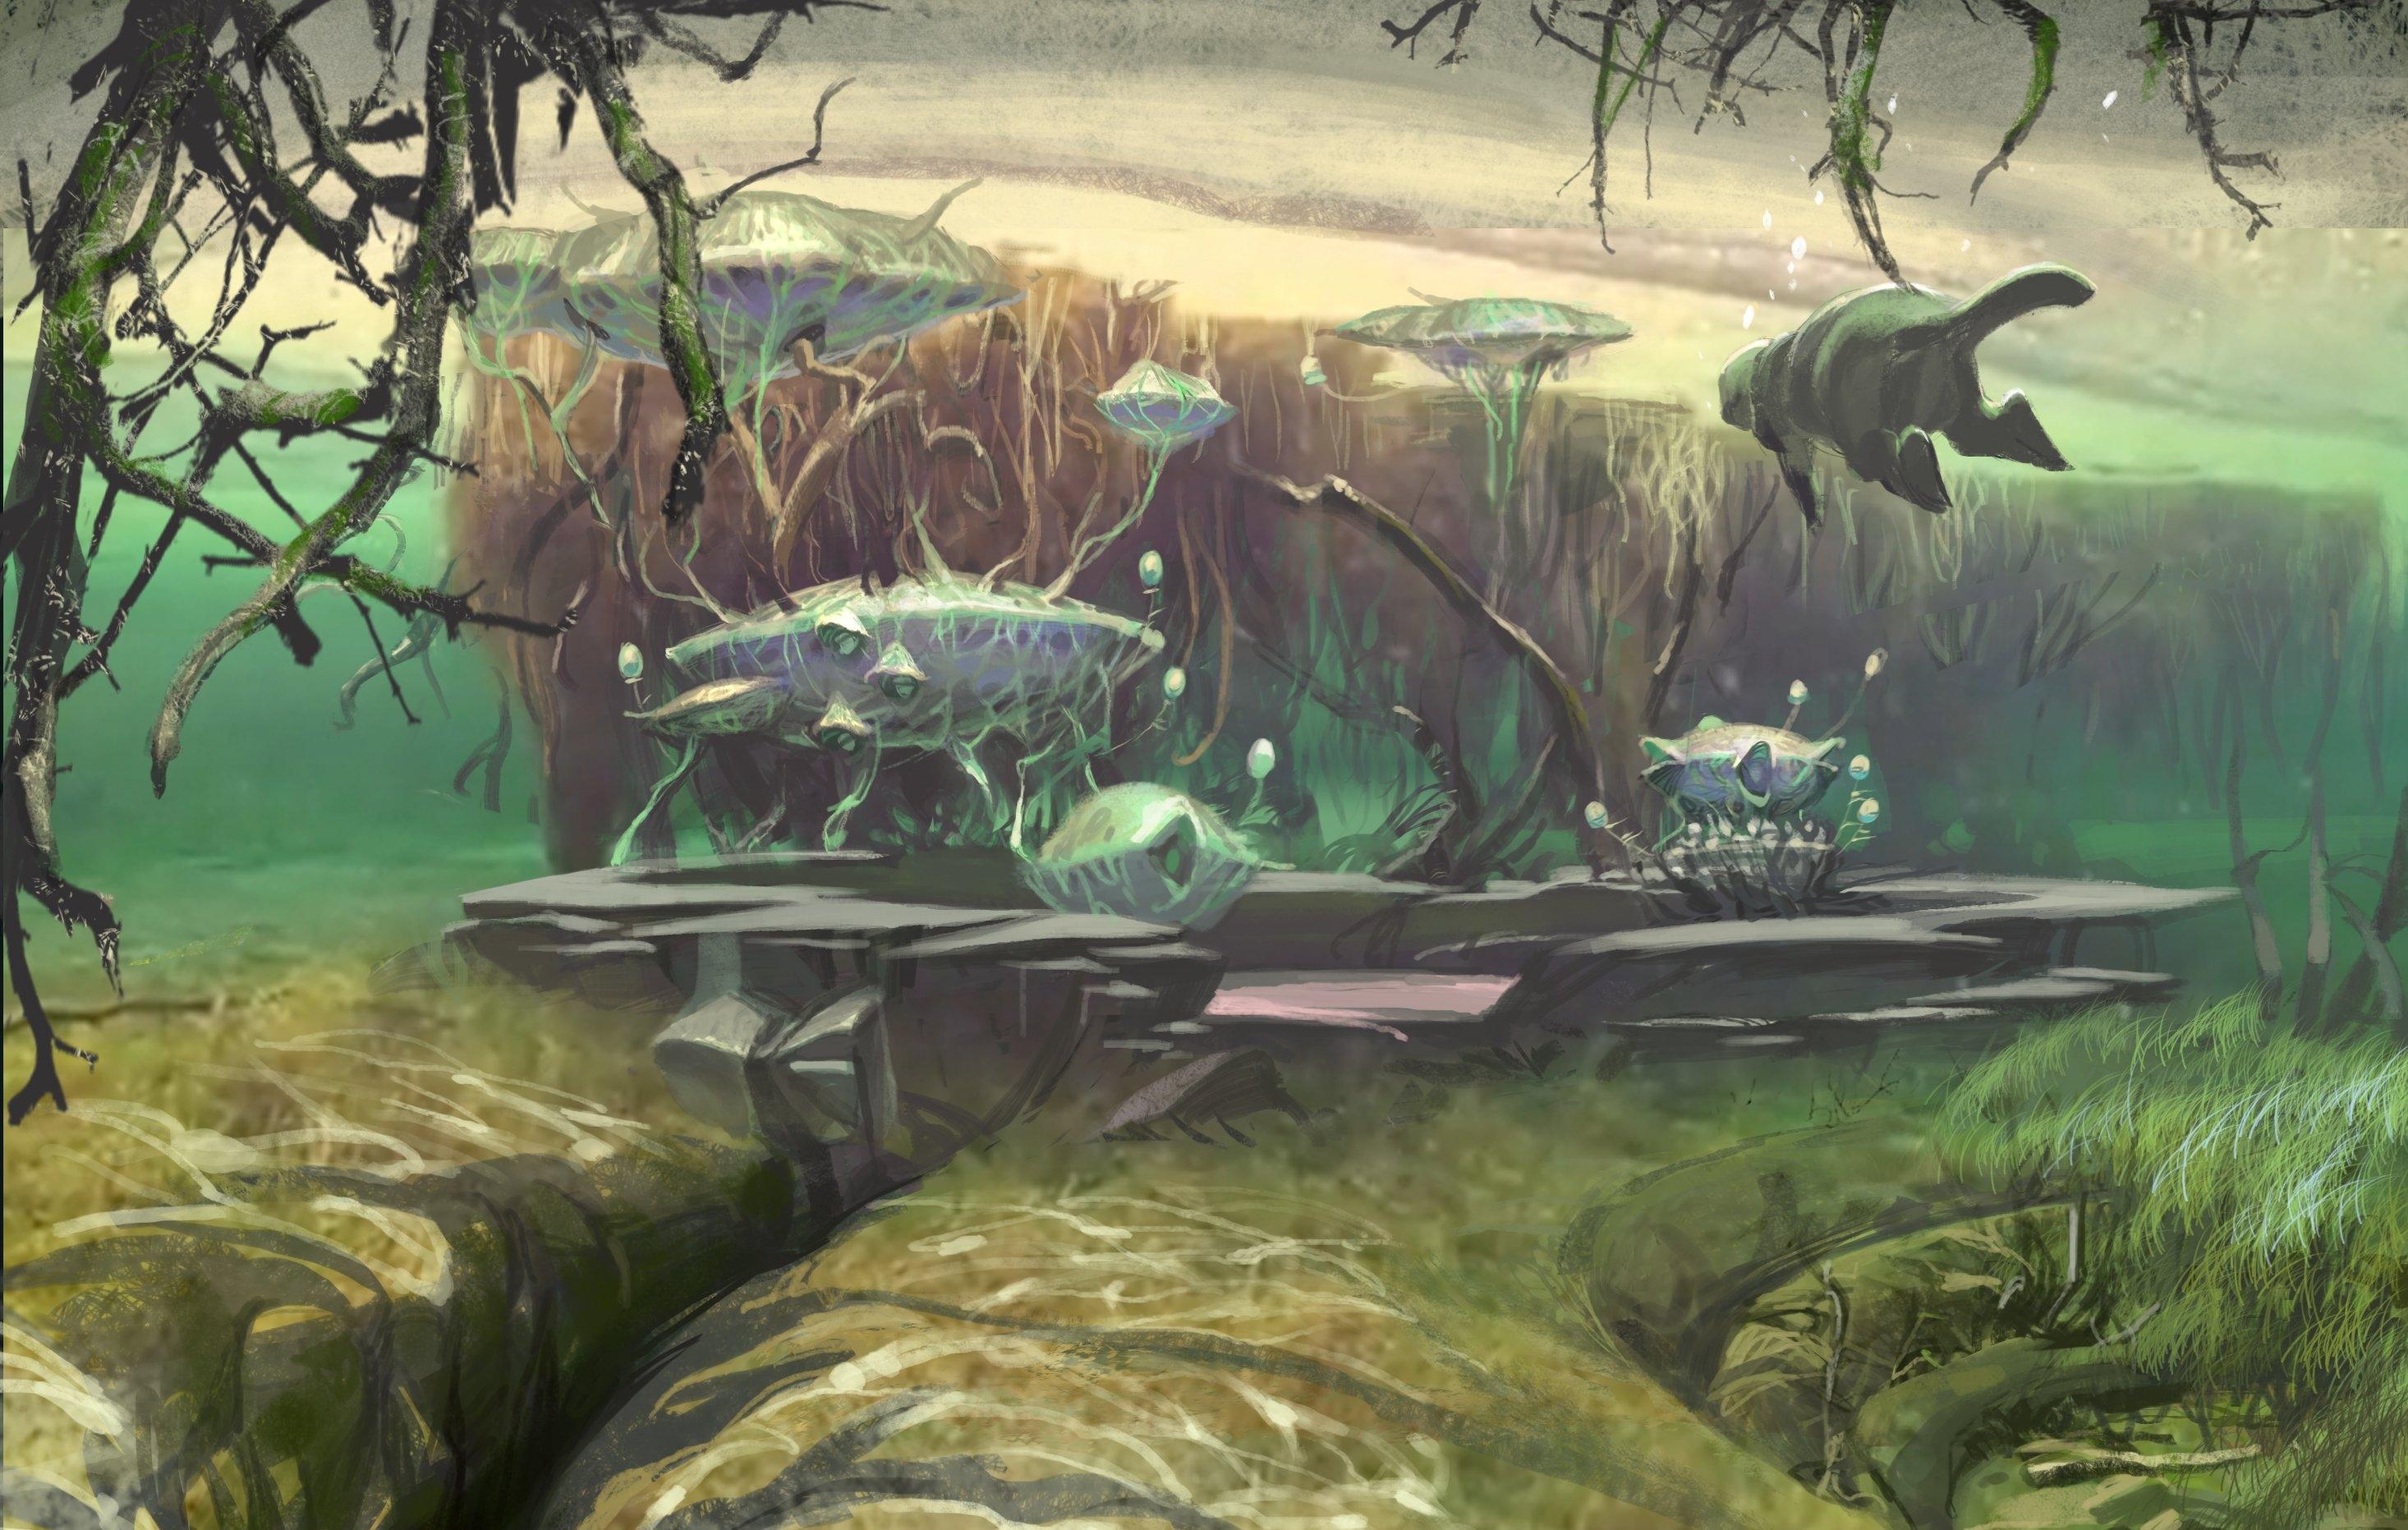 http://wiki.guildwars-2.ru/images/f/f7/Underwater_03_concept_art.jpg